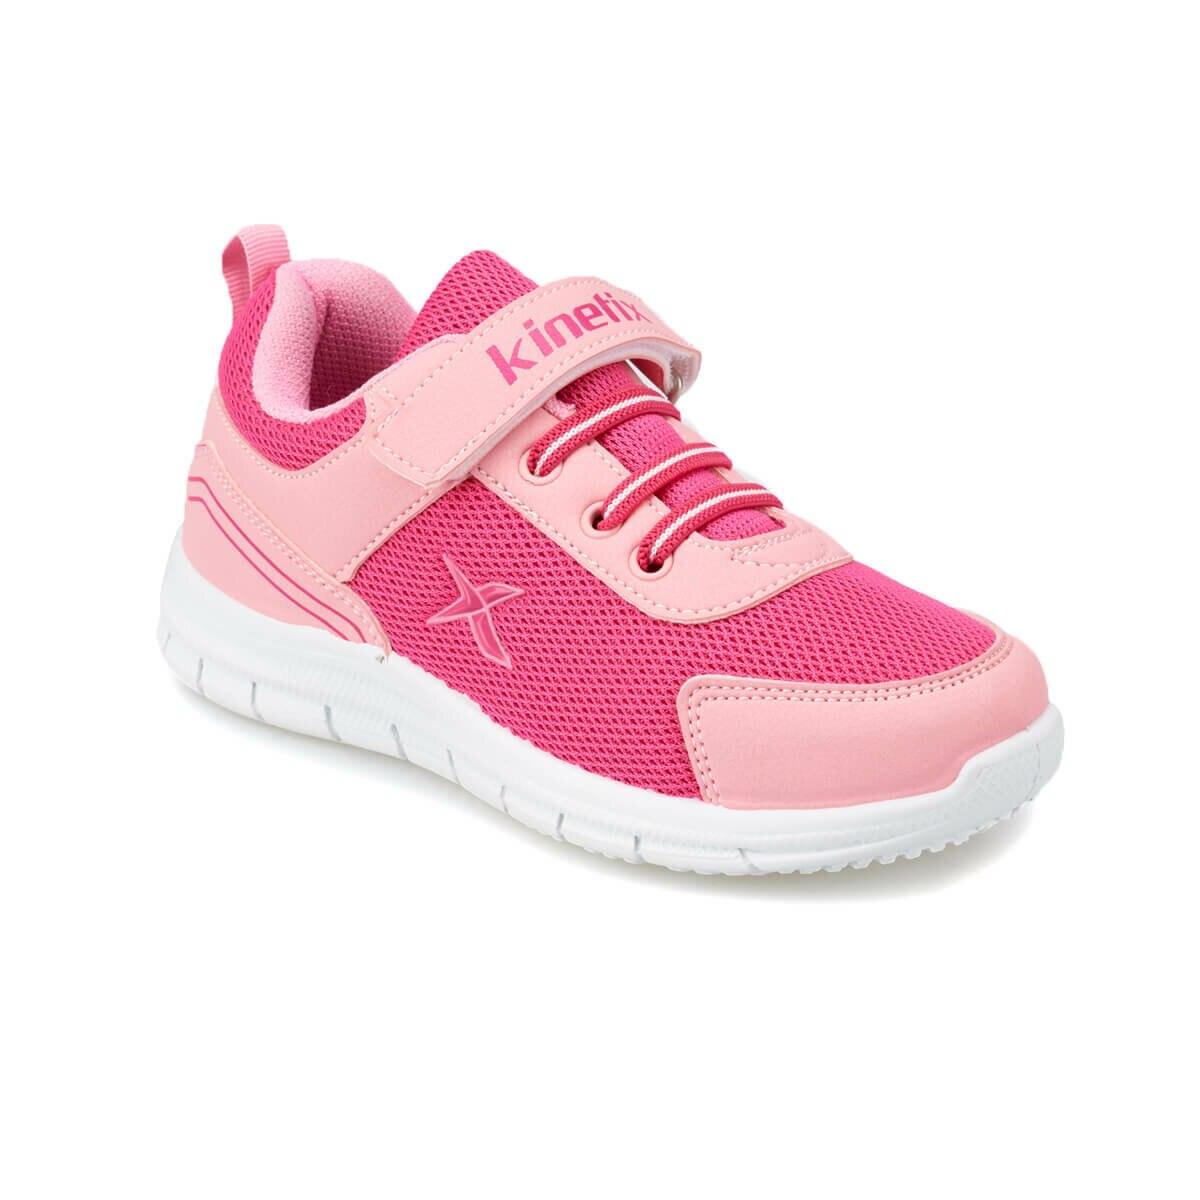 FLO ROGER Fuchsia Female Child Running Shoes KINETIX